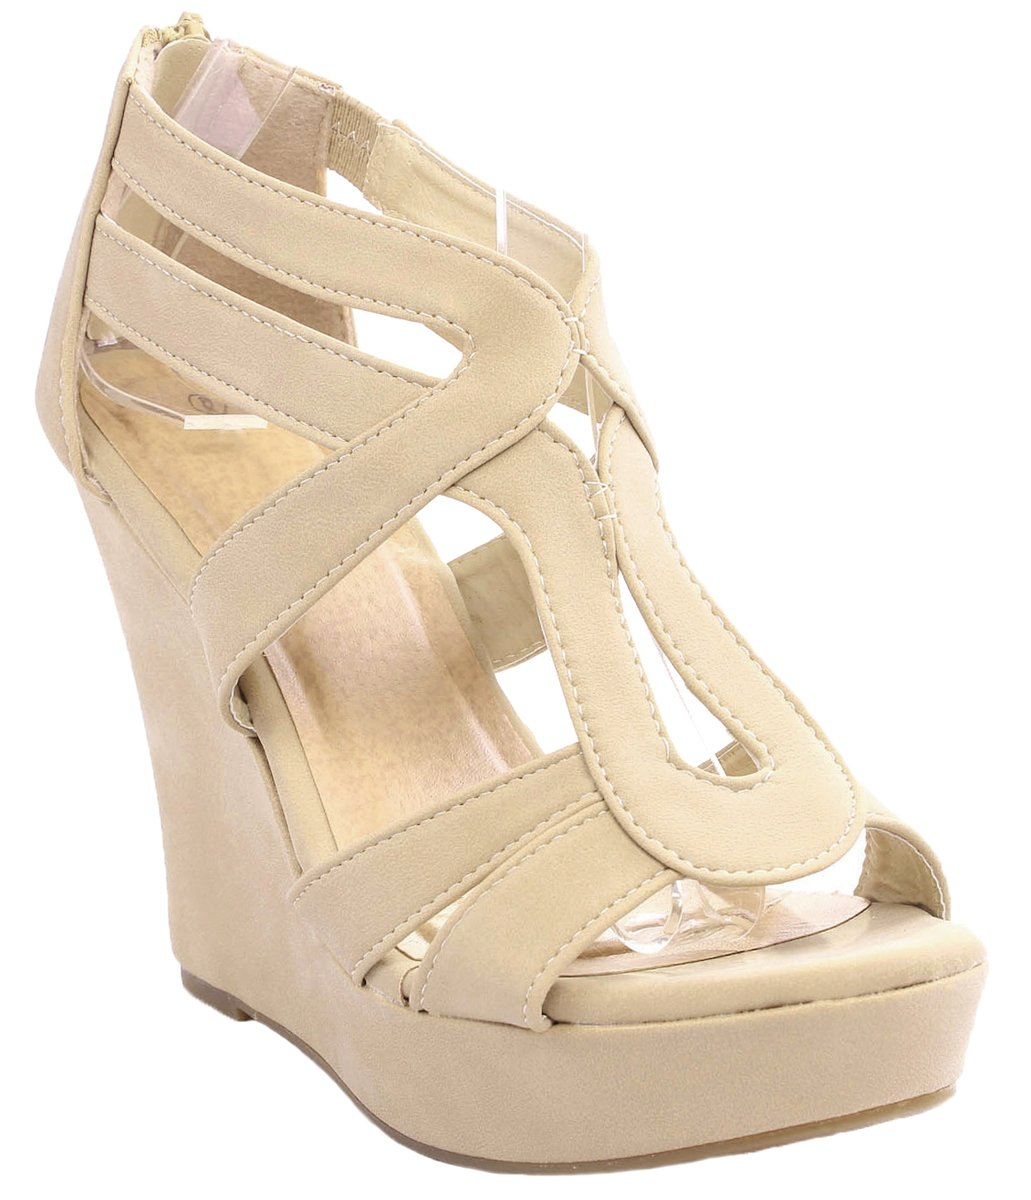 Women Lindy Comfort Gladiator Strappy Faux Leather/Nubuck Dress Platform High Wedge Sandals B071J7W3V1 7 B(M) US|Beige_l3